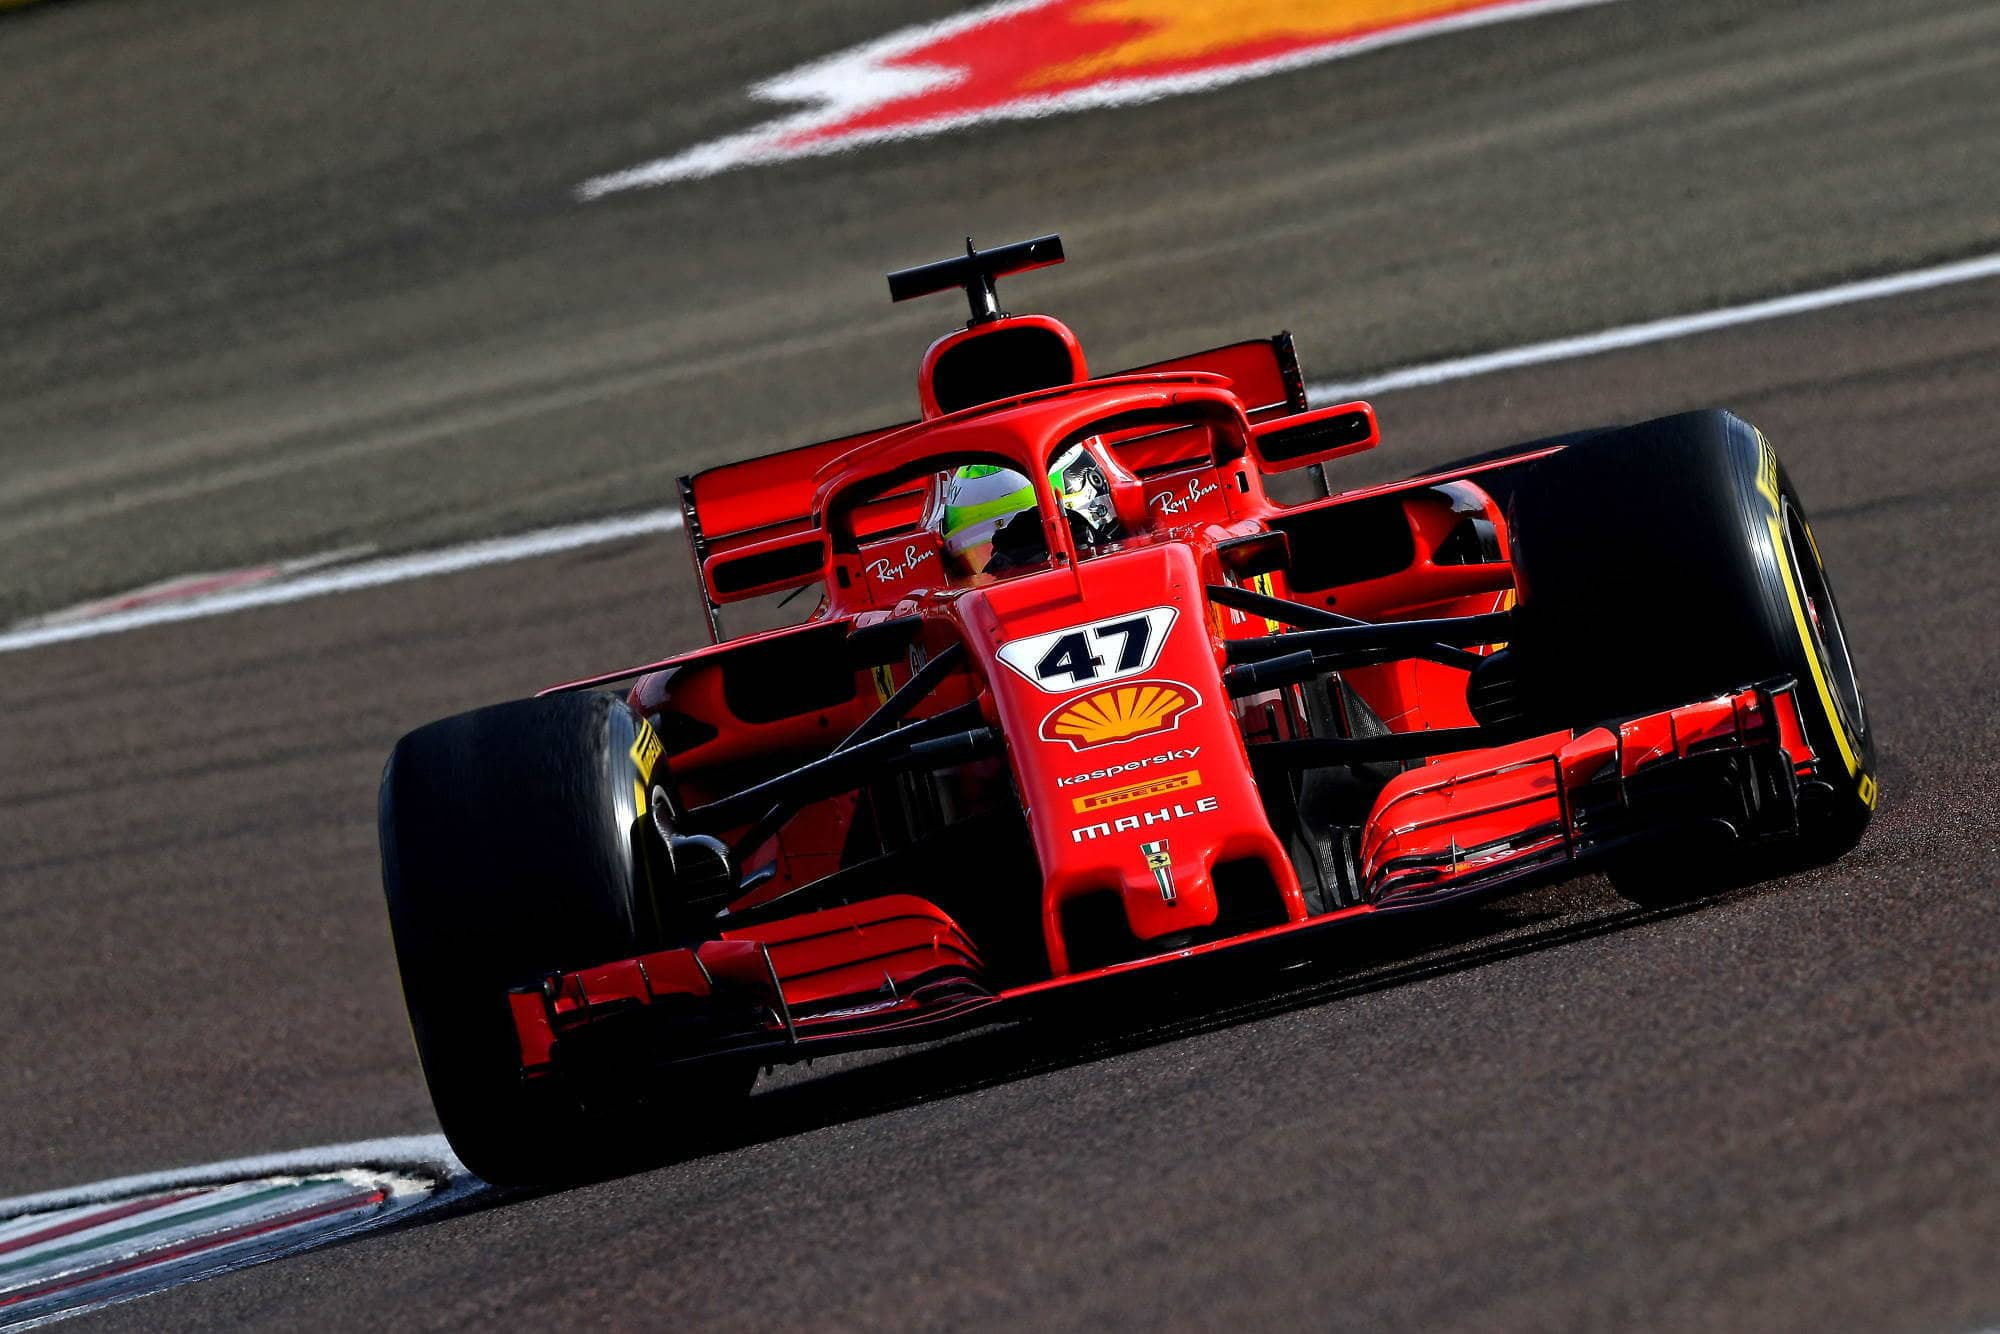 2021 Fiorano Mick Schumacher on track Fiorano Ferrari SF71H 2018 on Thu 28 Jan 2021 Photo Ferrari